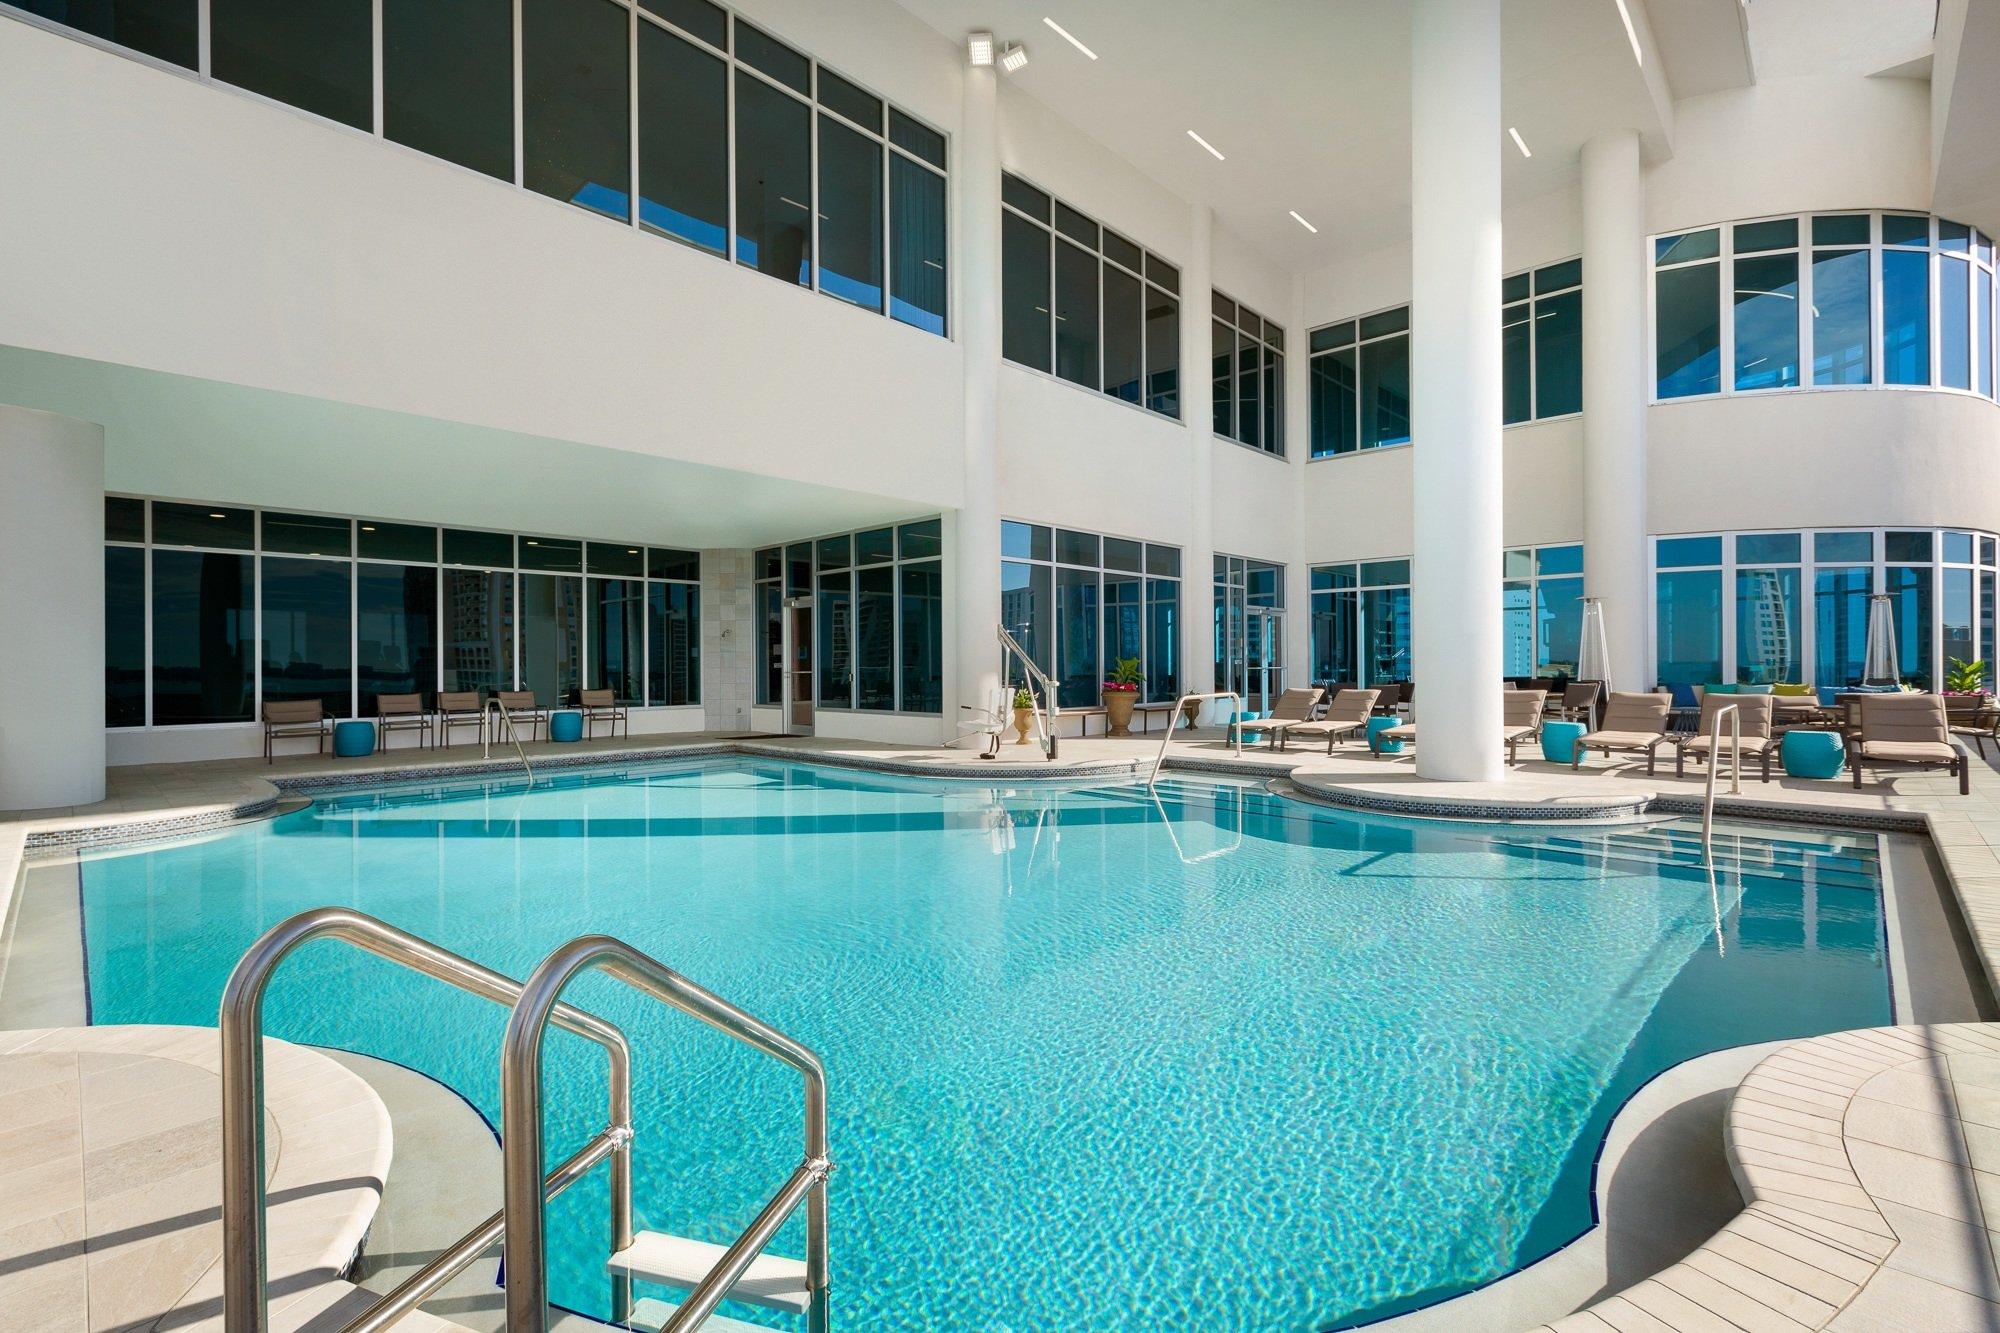 Embassy Suites by Hilton Sarasota Pool